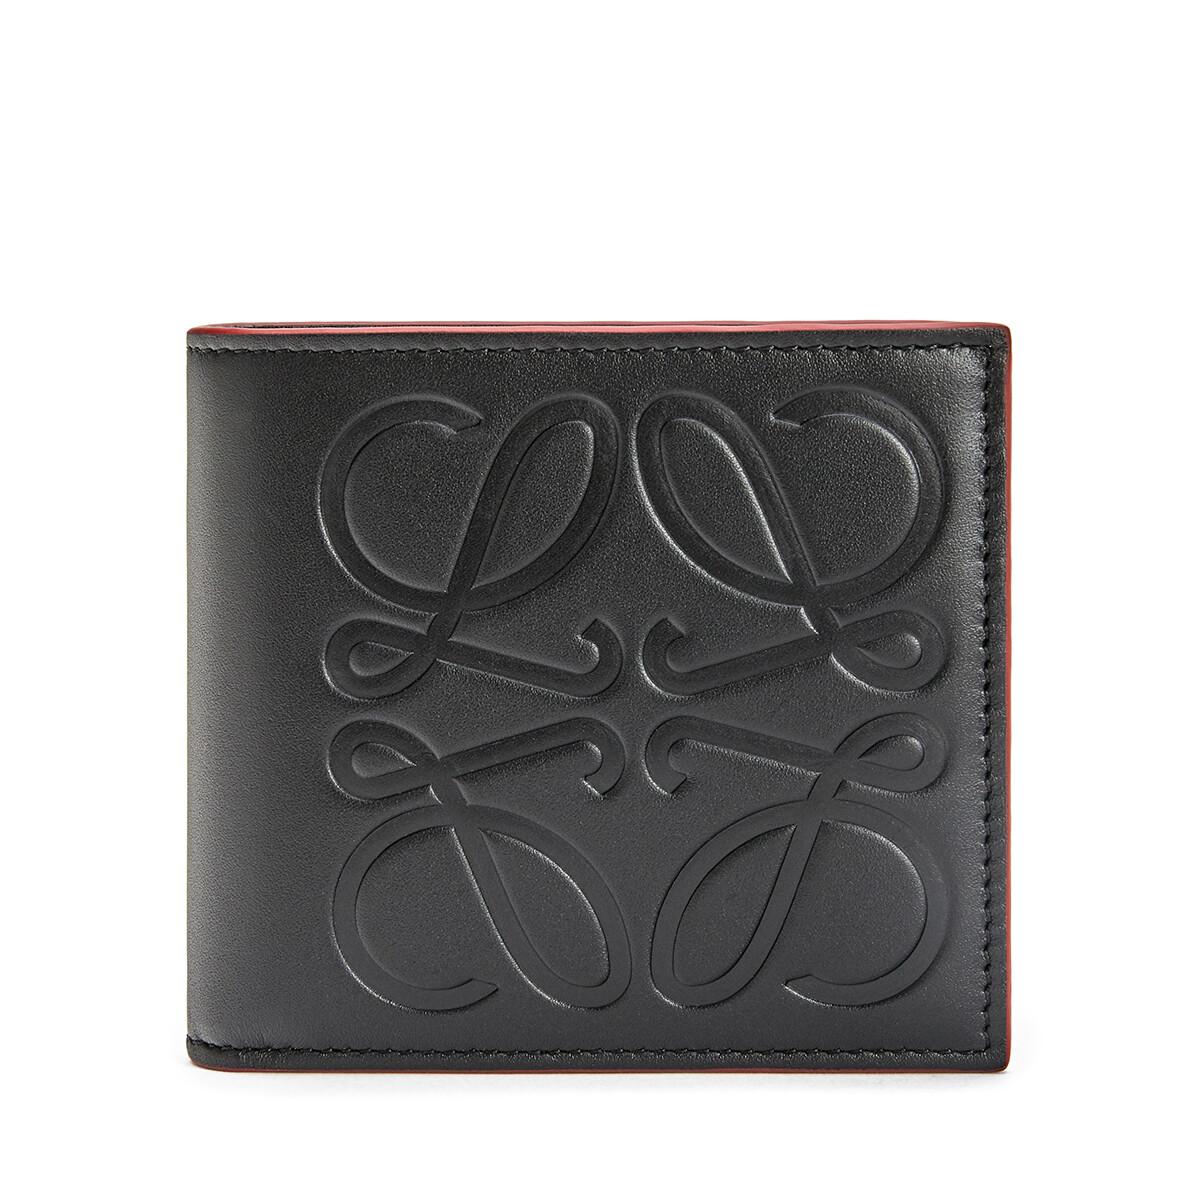 LOEWE Brand Bifold Coin Wallet Black front